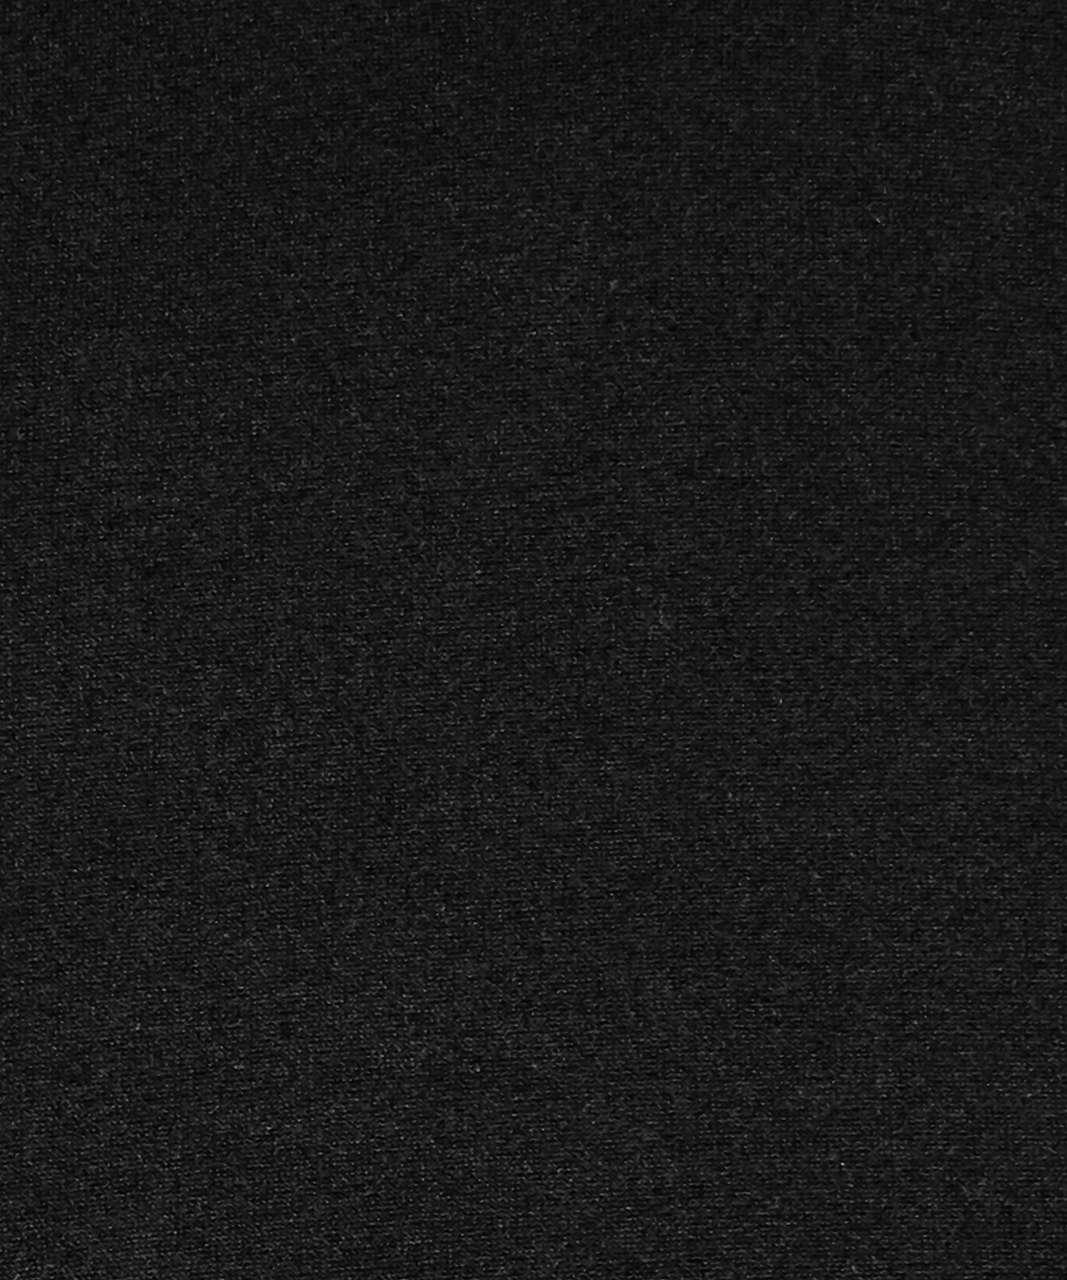 Lululemon Reveal Tight *Mindful Motion - Black